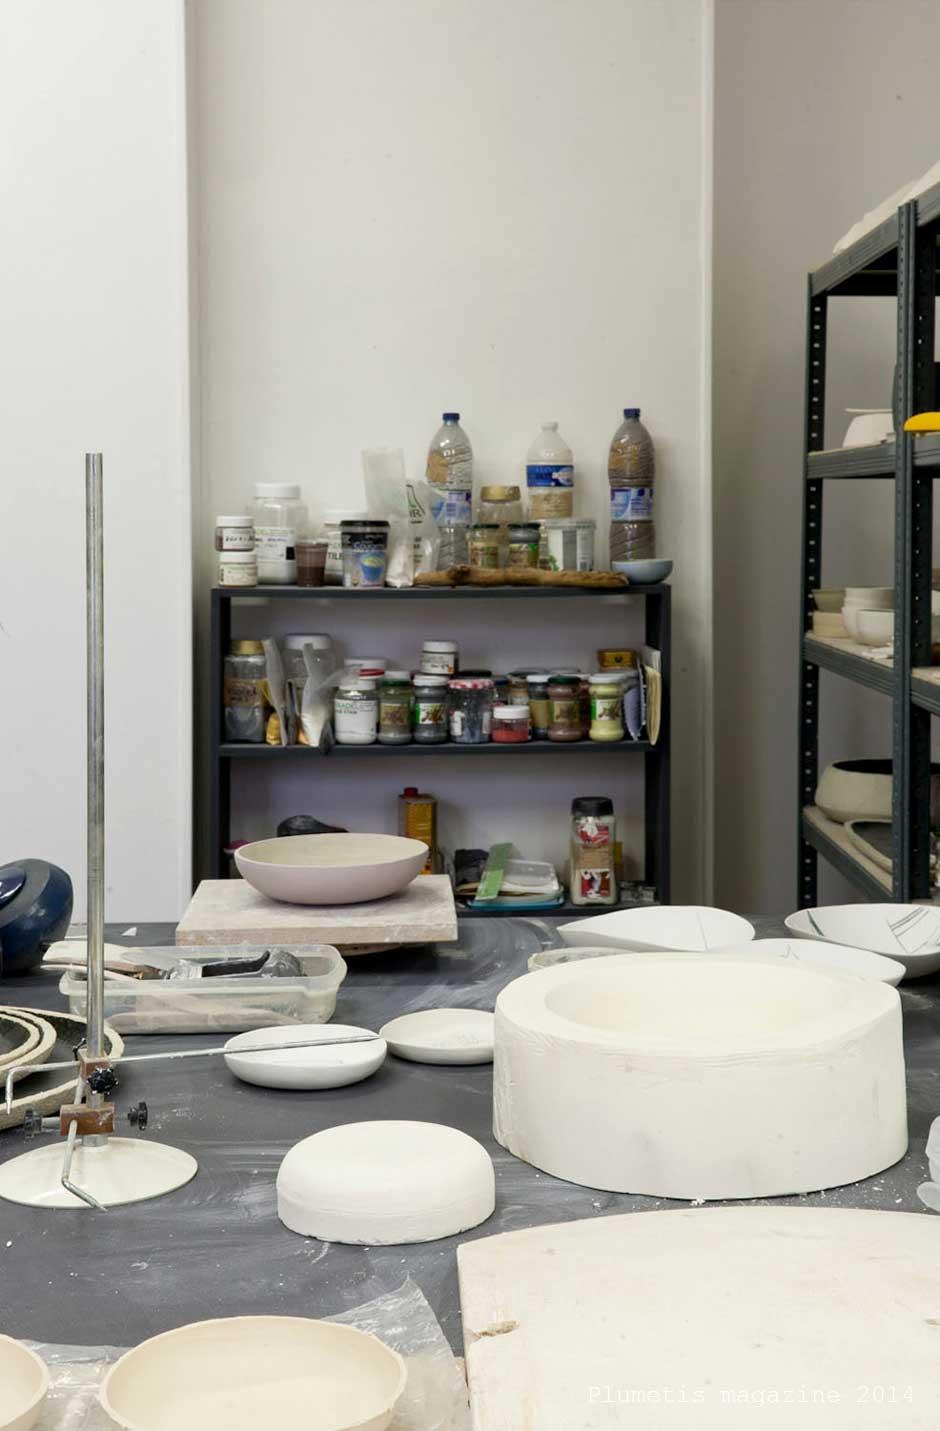 visite-atelier-sandrine-pagny8